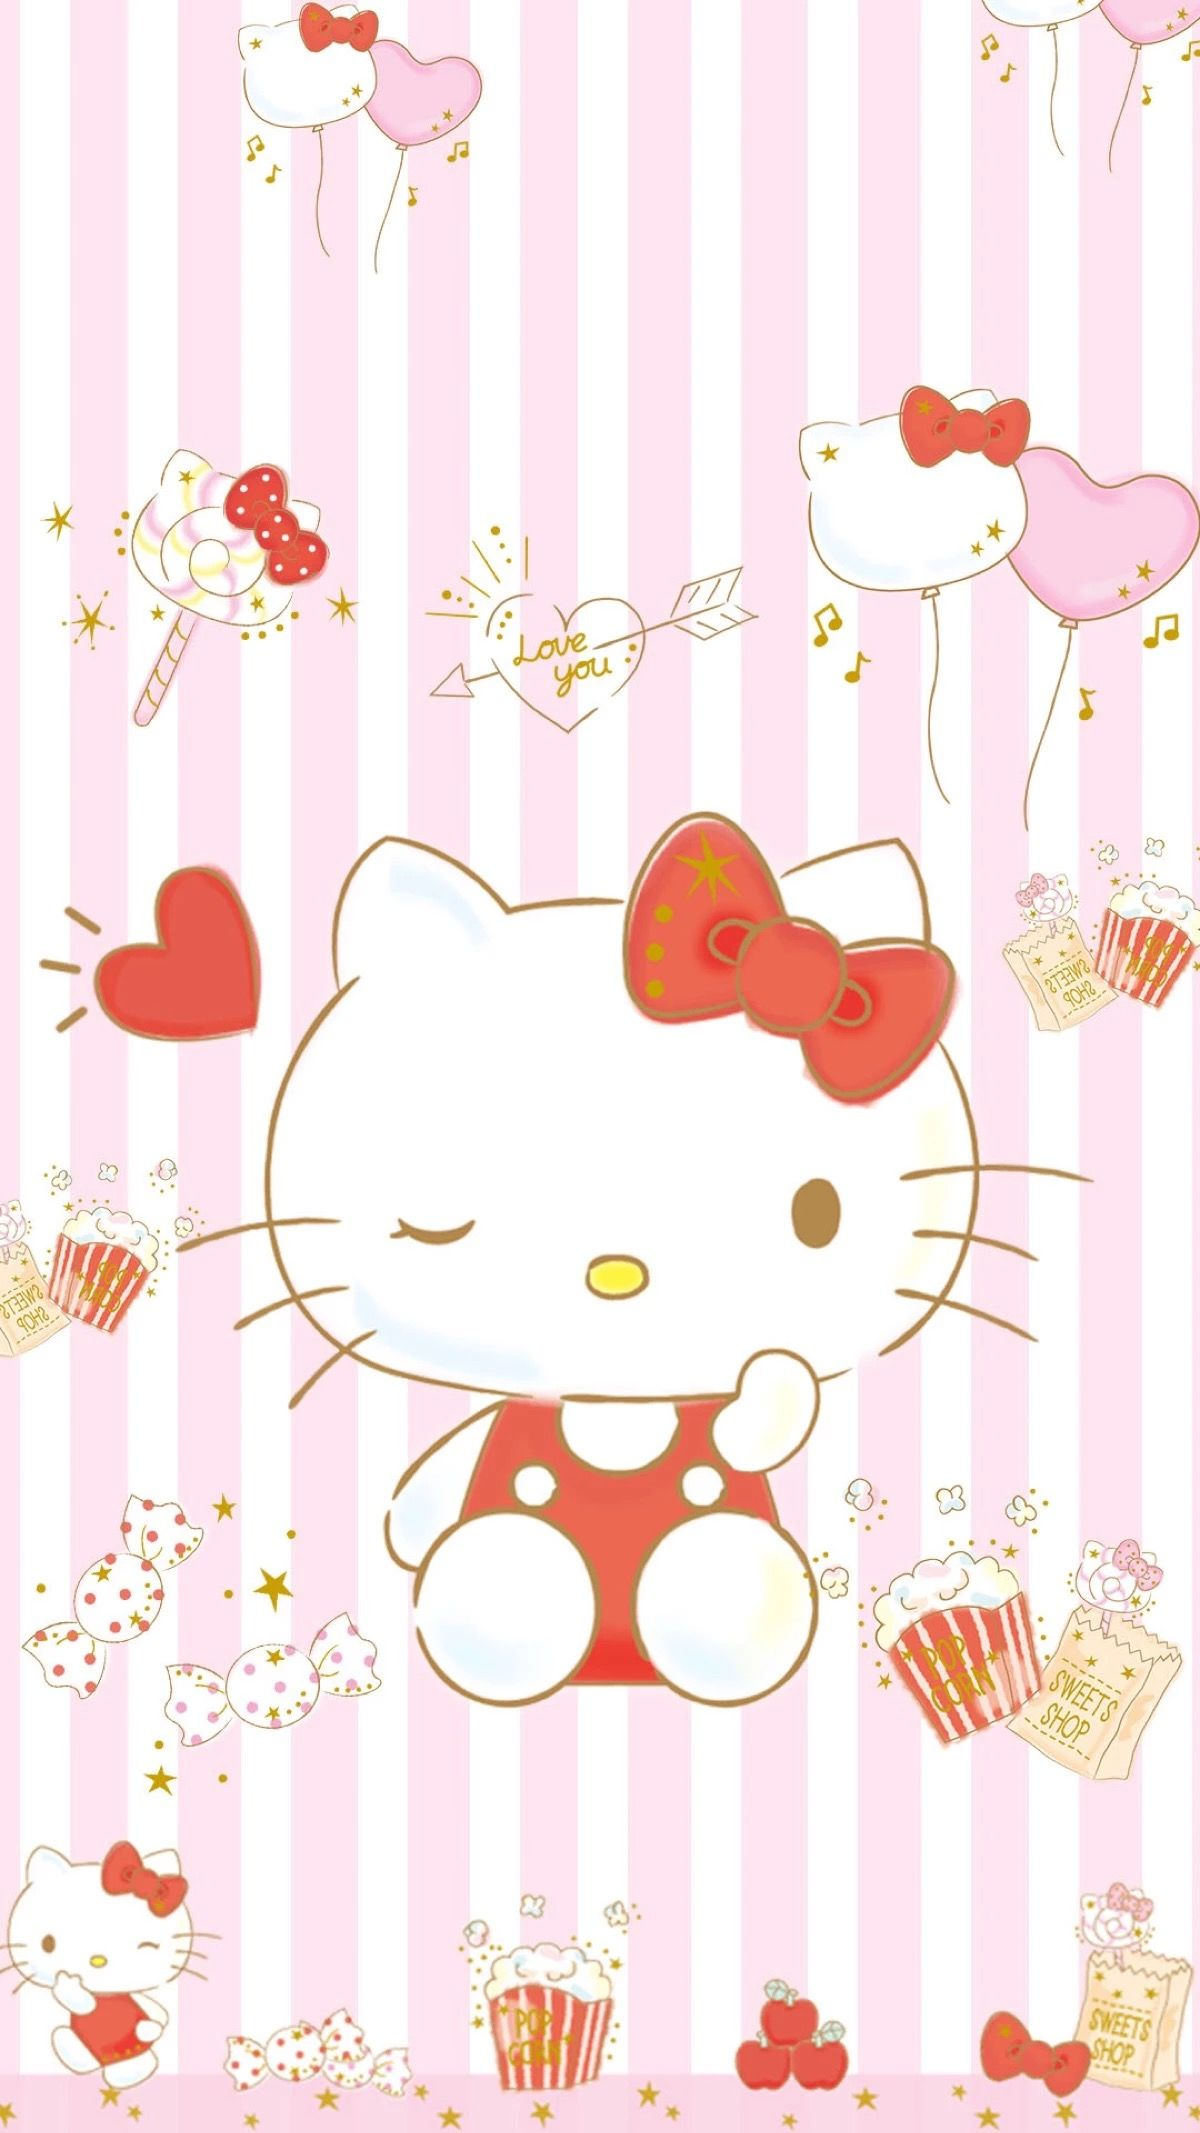 Simple Wallpaper Hello Kitty Computer - 2d3c085ac0d8793105cec54826ea9a8c  Gallery_245232.jpg